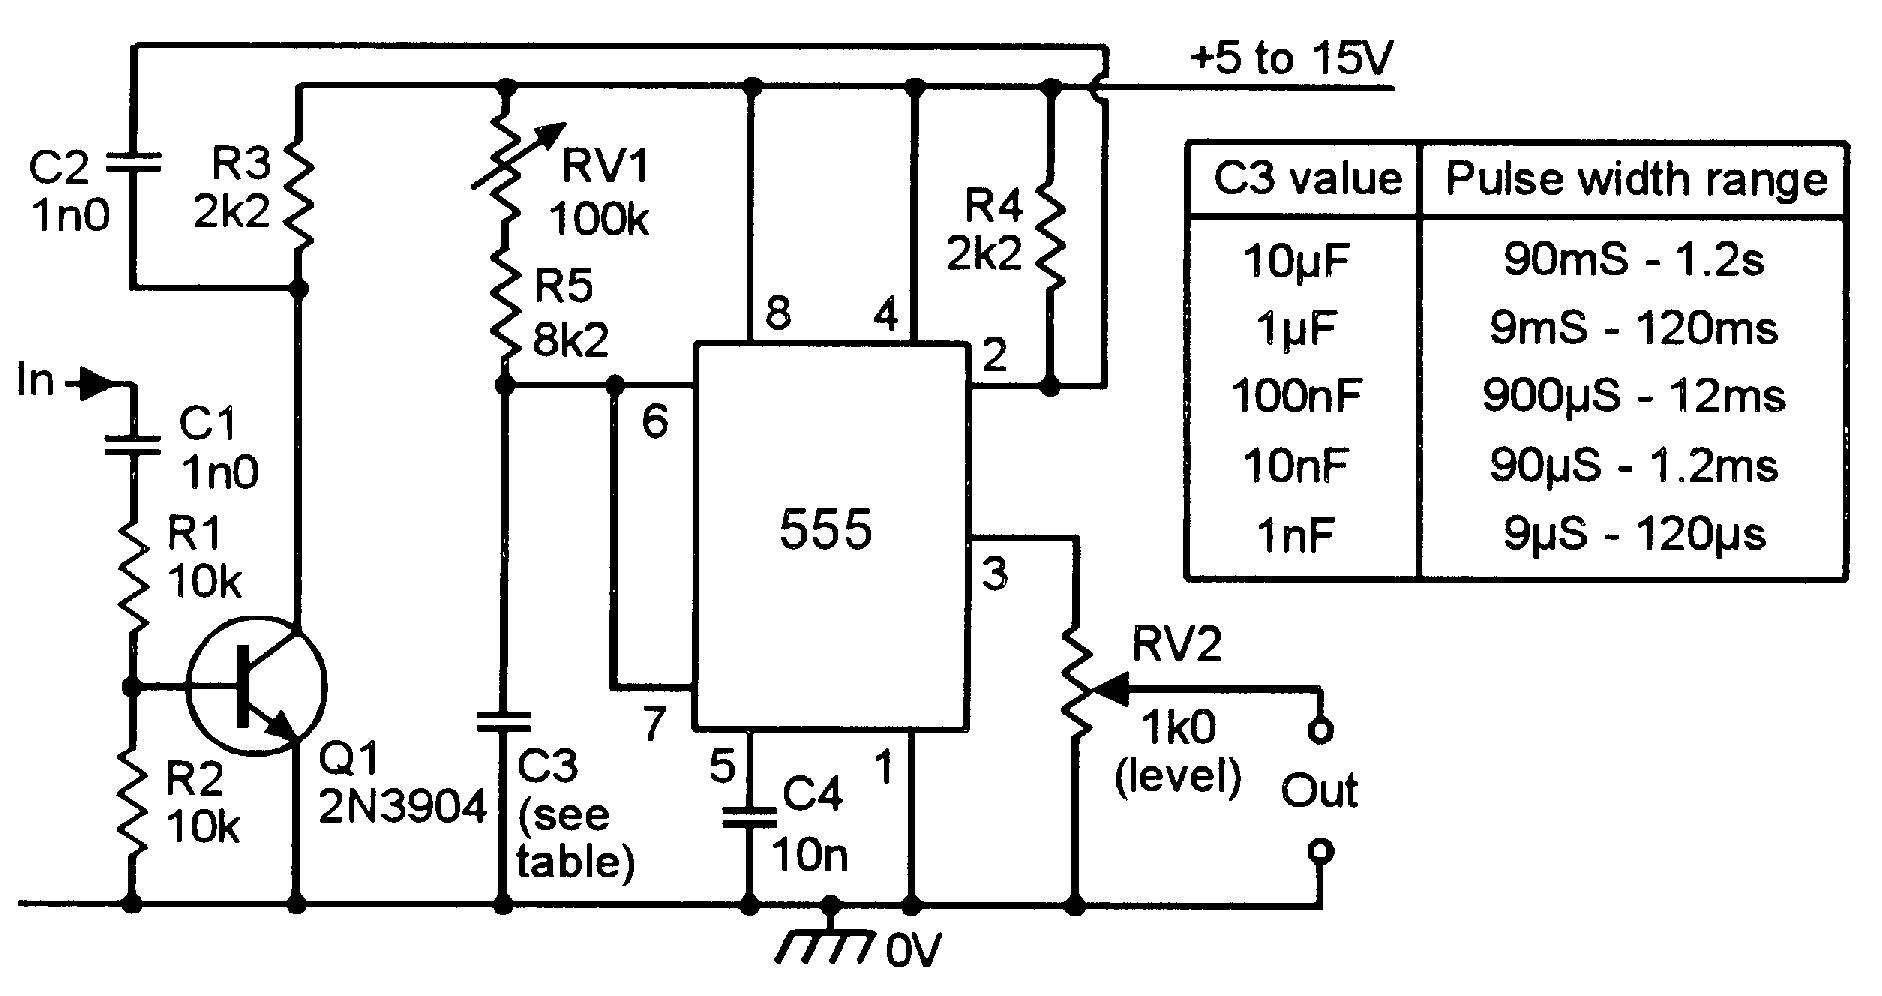 Tremendous 555 Pulse Generator Circuit Basic Electronics Wiring Diagram Wiring Cloud Licukshollocom